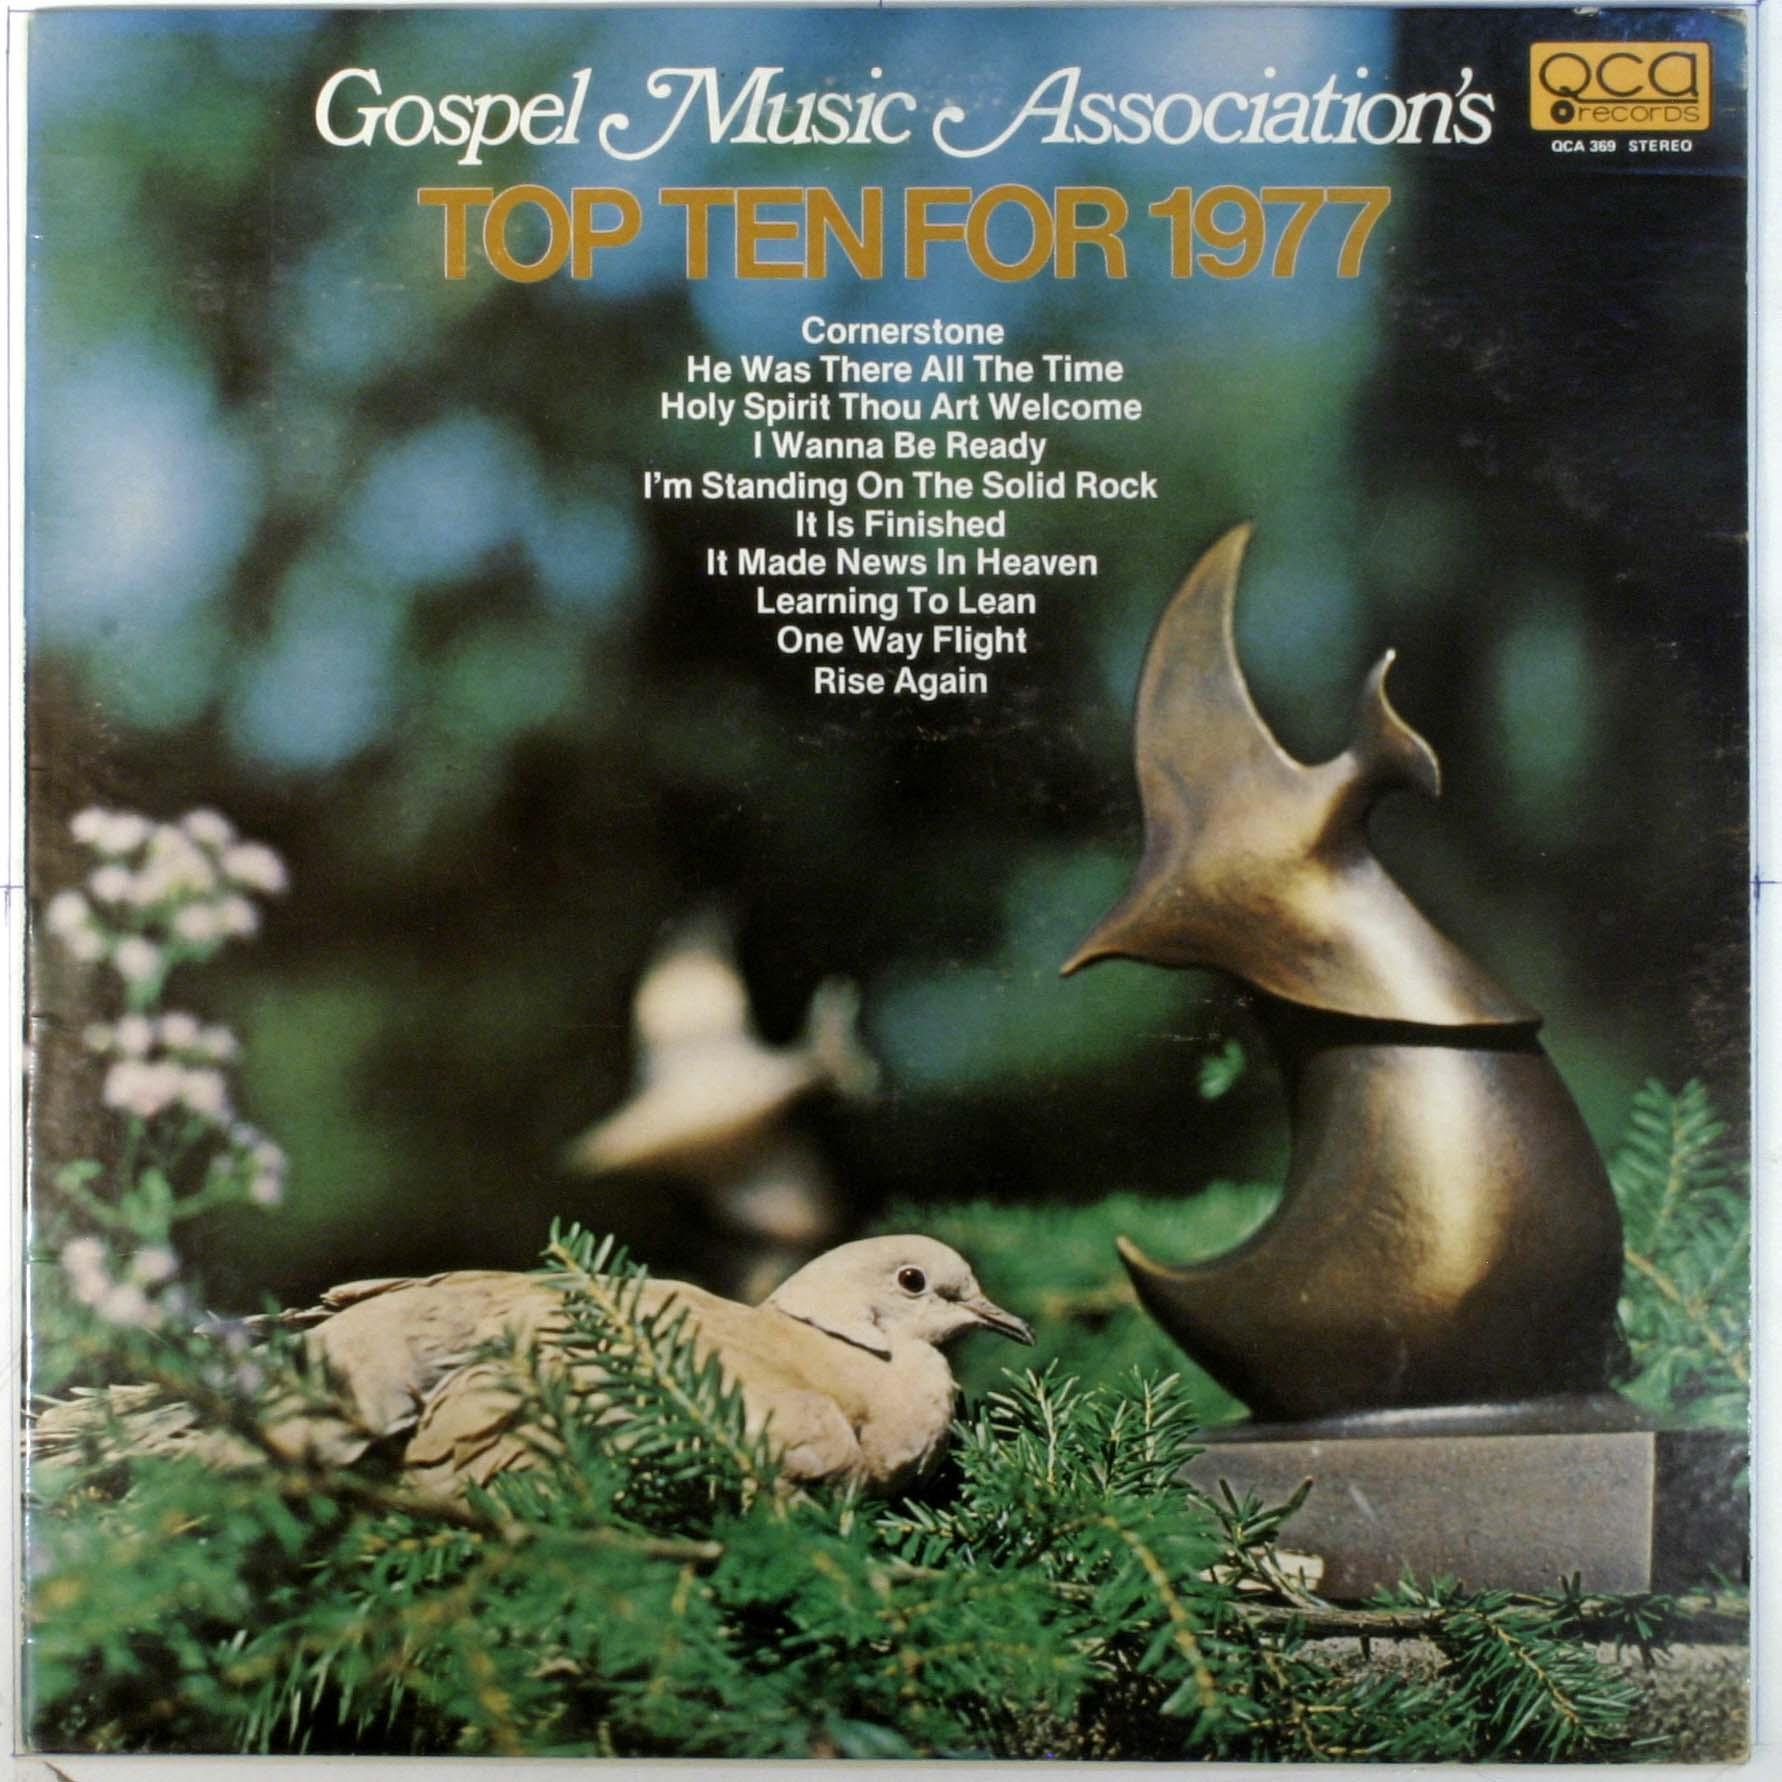 Gospel Music Association - Top Ten For 1977